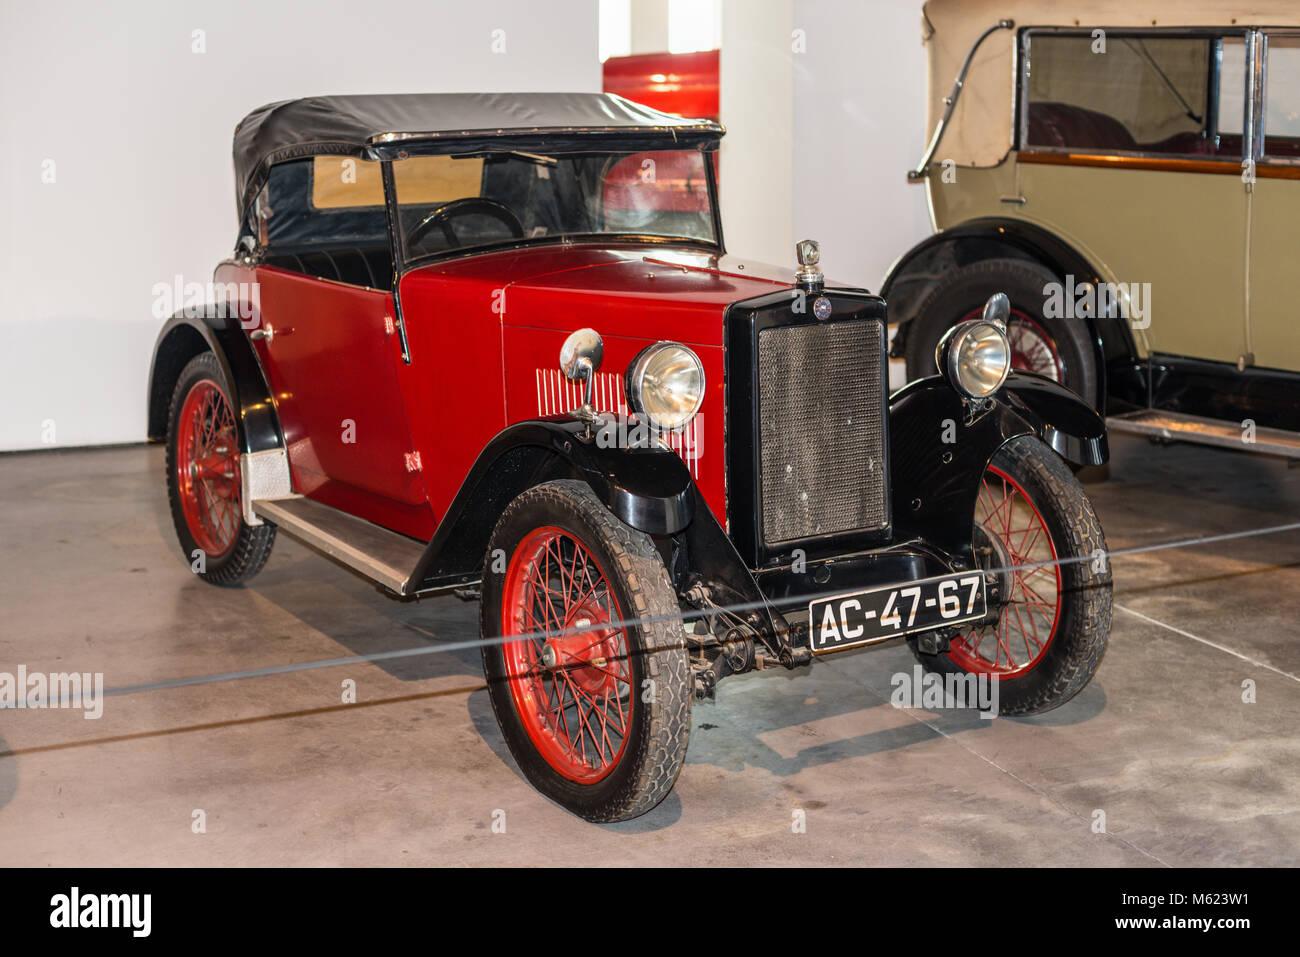 Malaga Car Museum Stock Photos Malaga Car Museum Stock Images  # Muebles Mogar Malaga